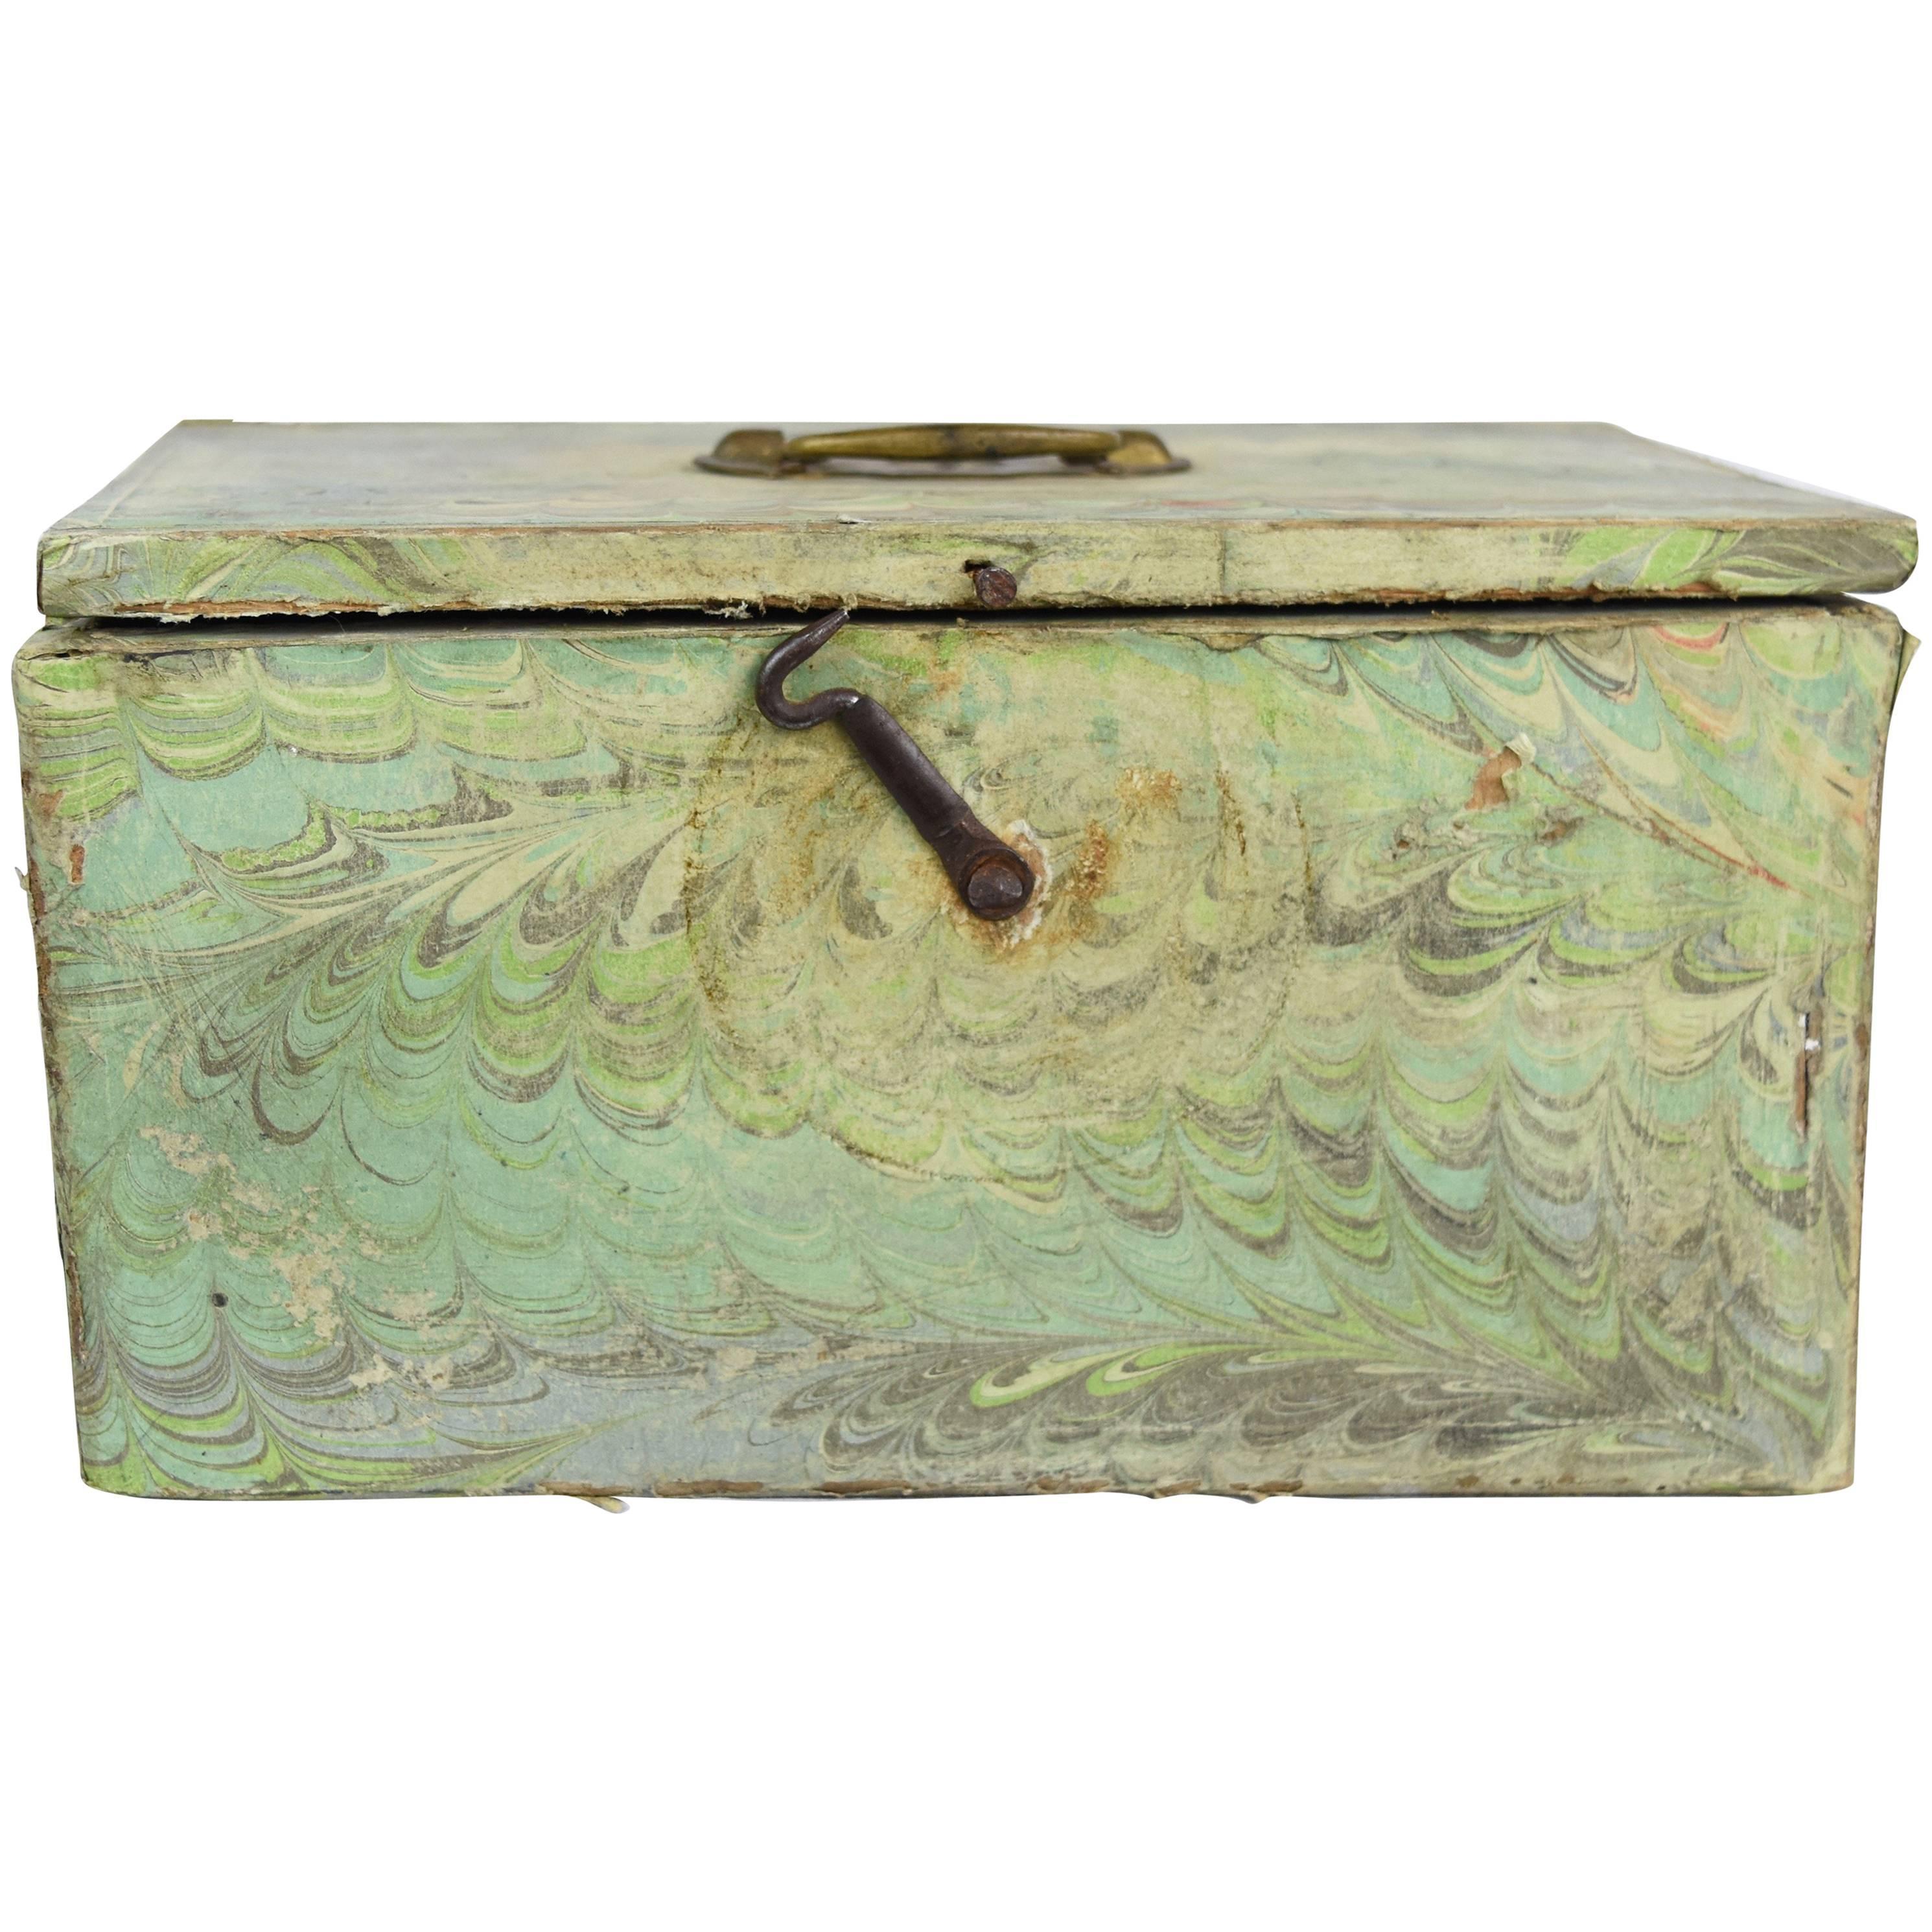 1900s Italian Decoupage on Wooden Storage Box